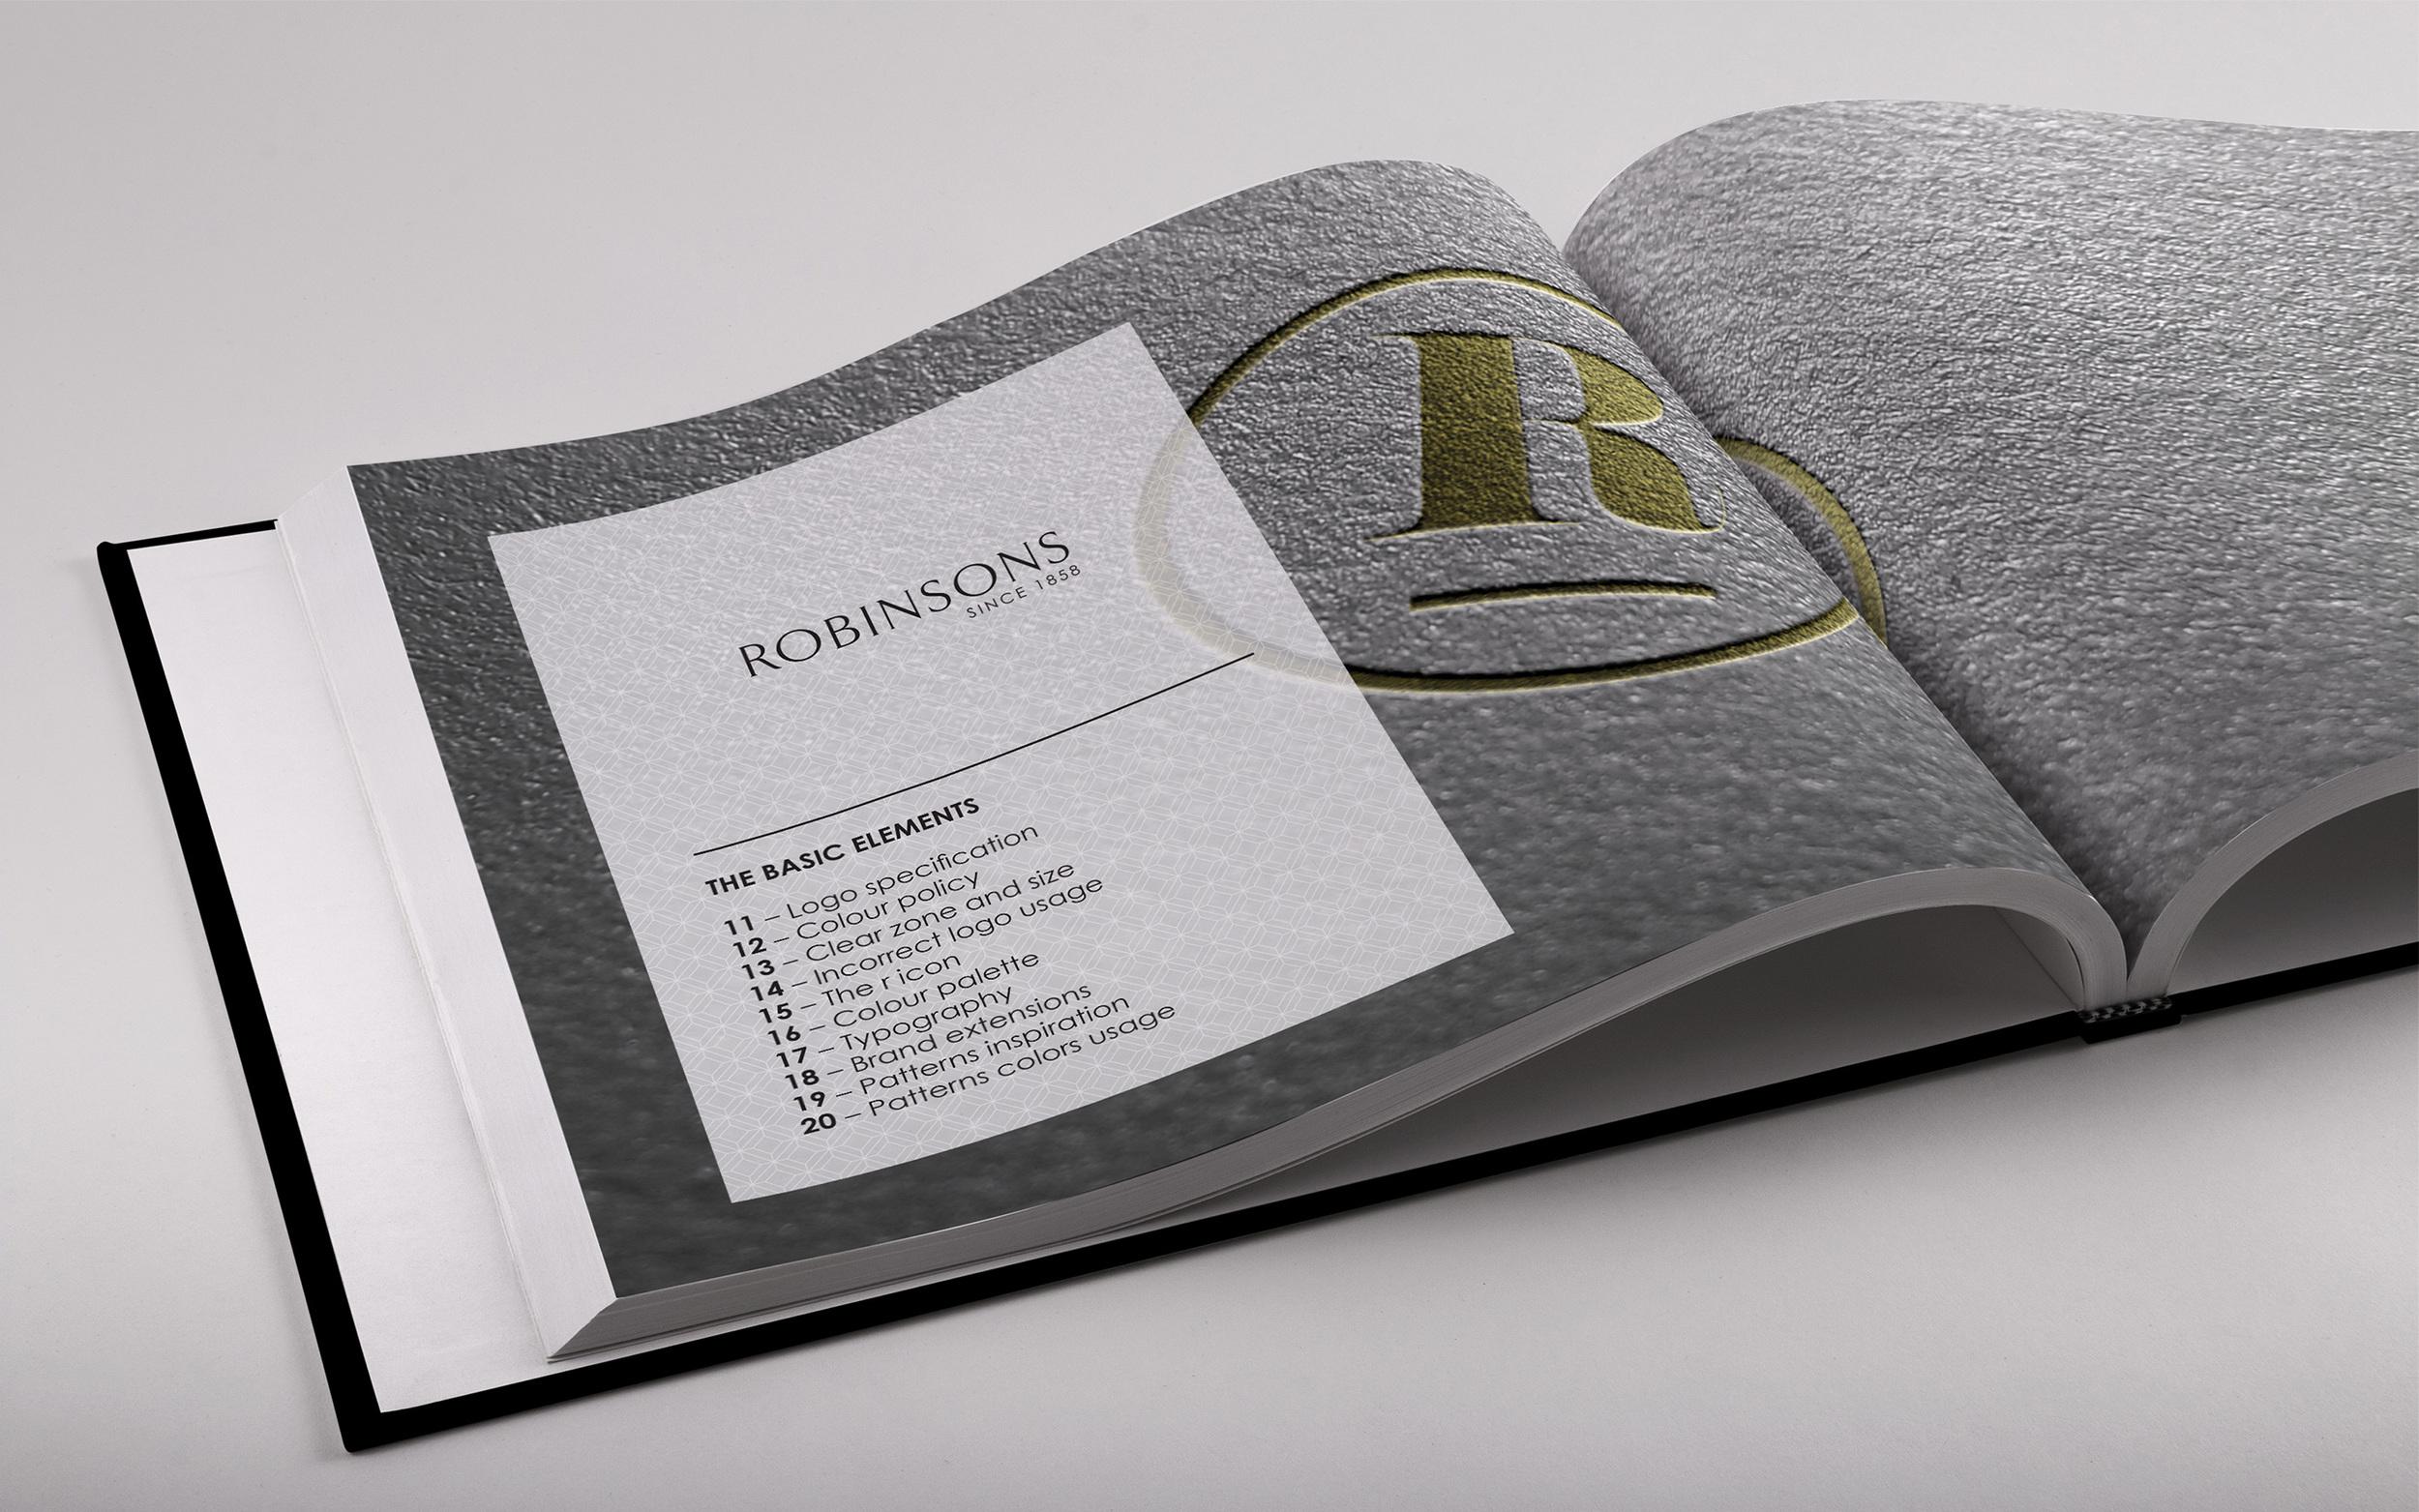 robinsons-design-childer-02.jpg